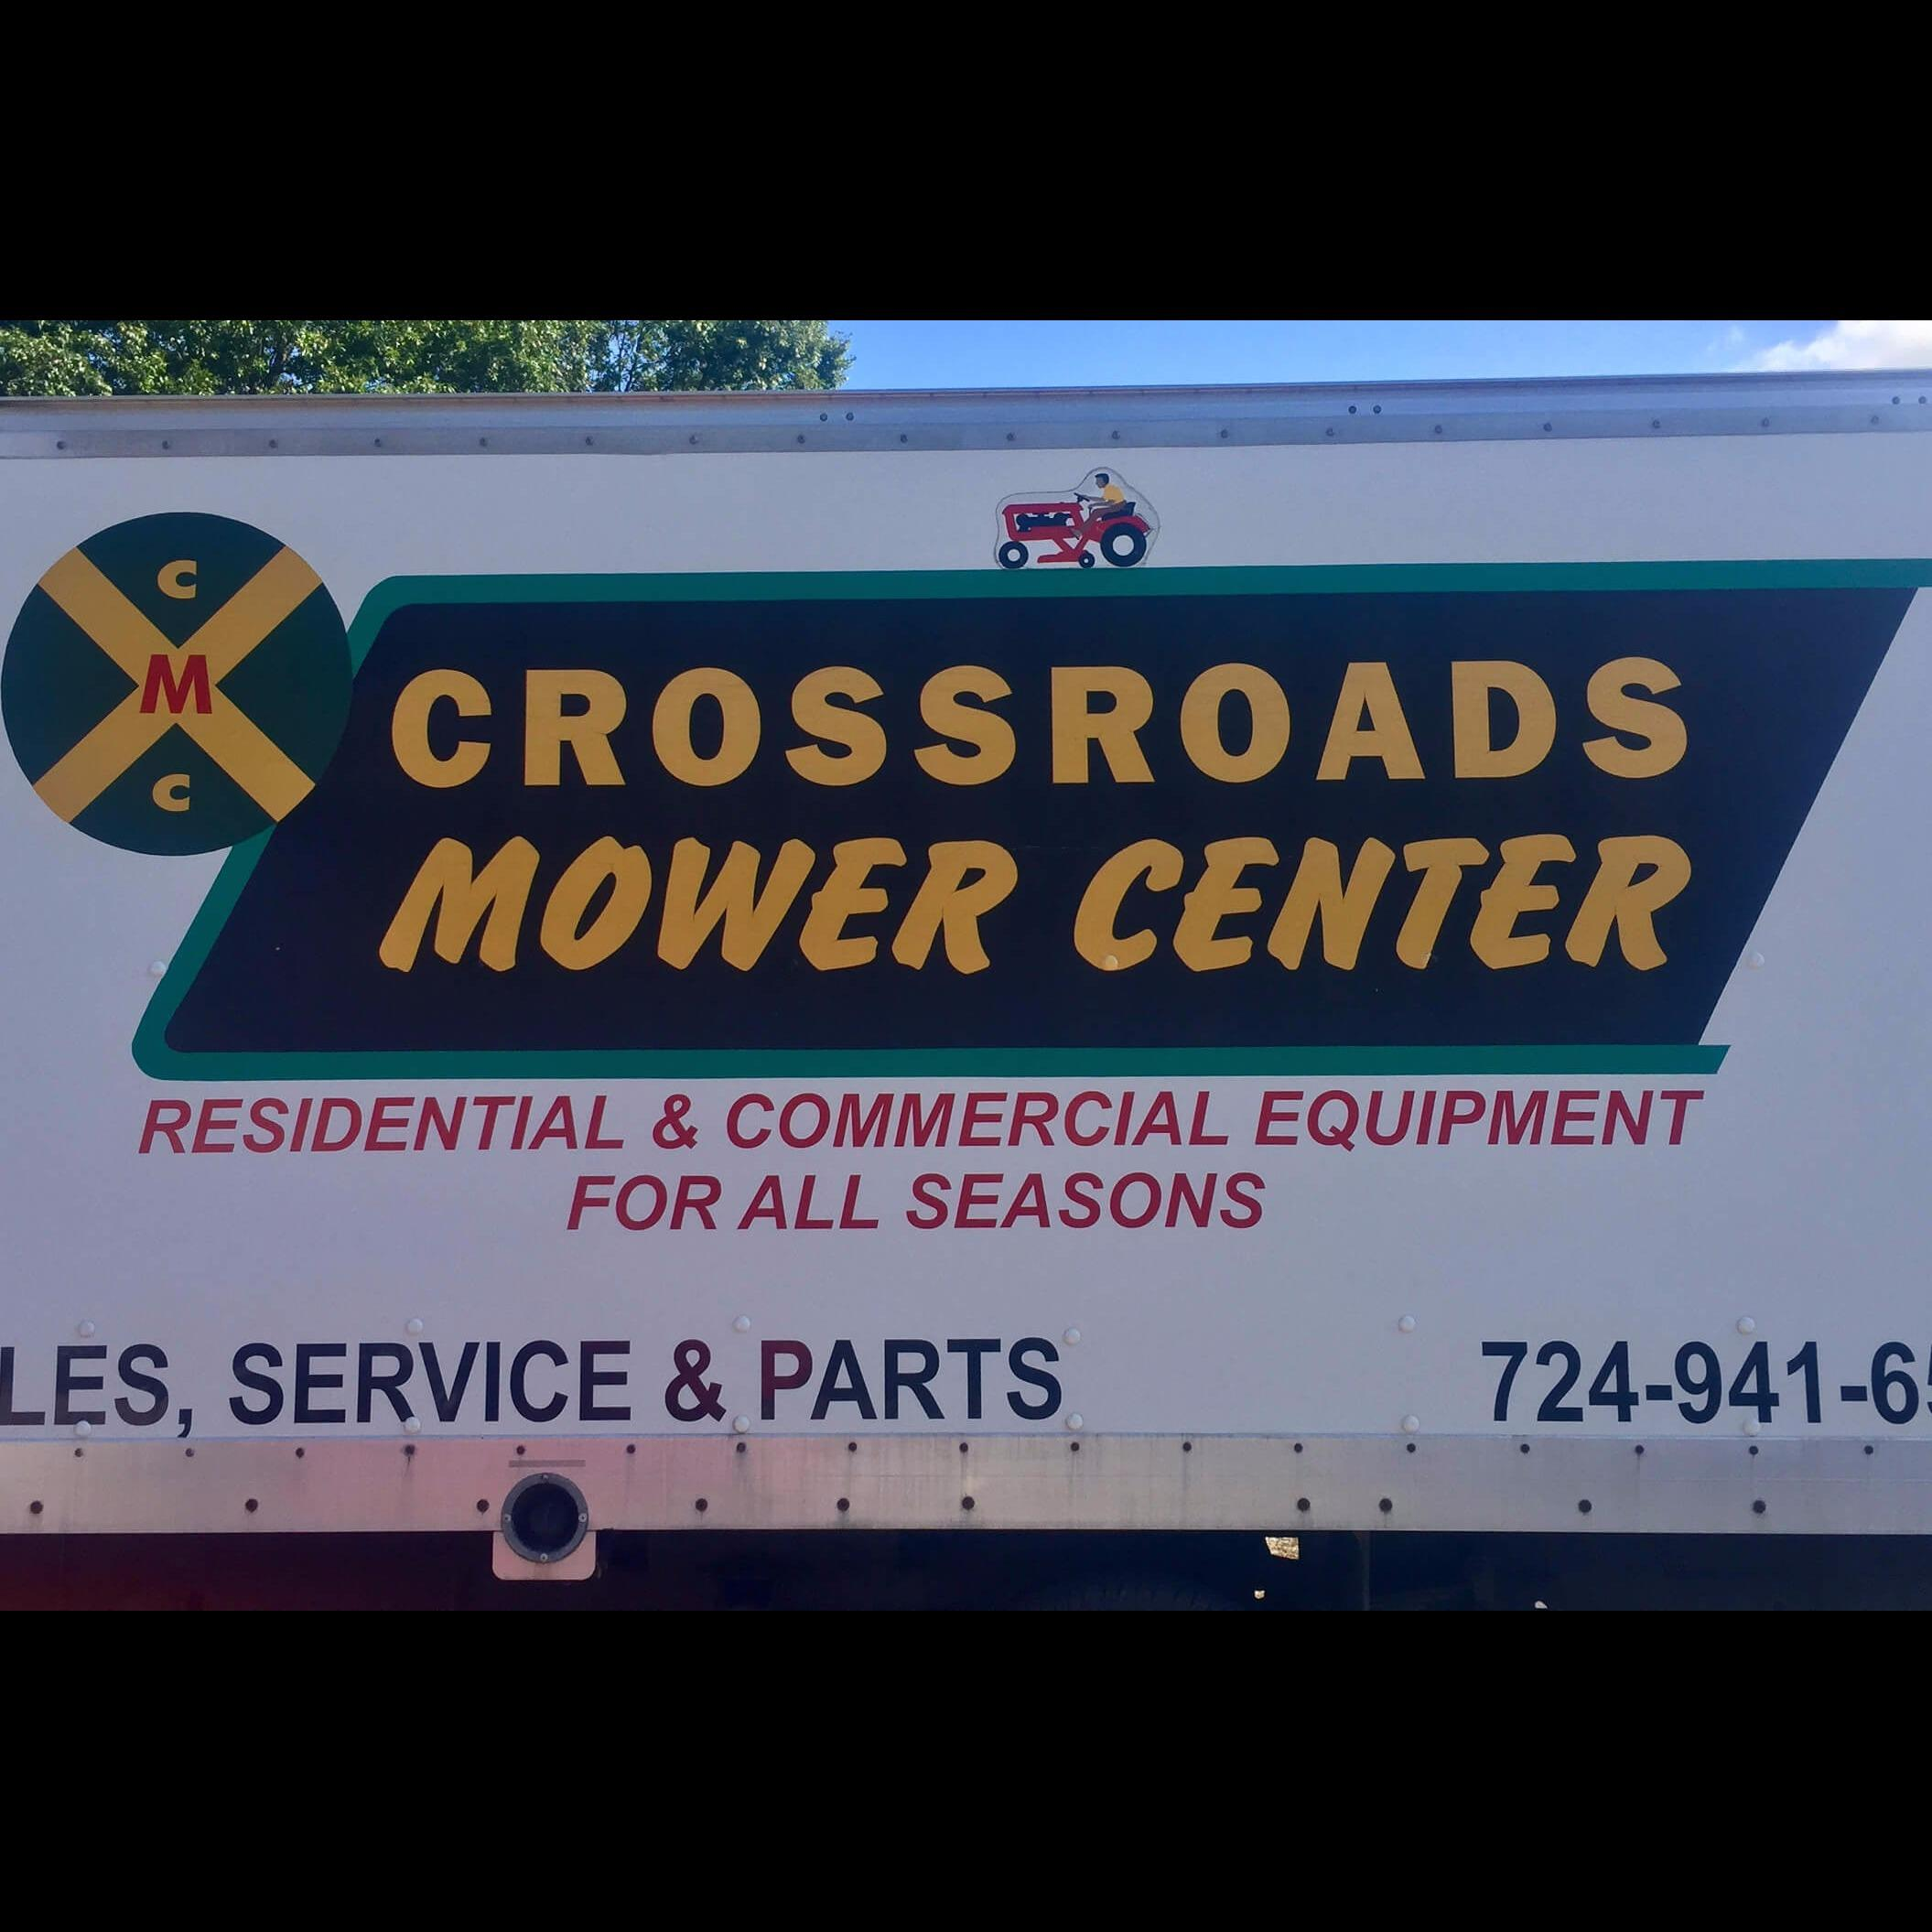 Crossroads Mower Center Inc - Mc Murray, PA - Lawn Care & Grounds Maintenance